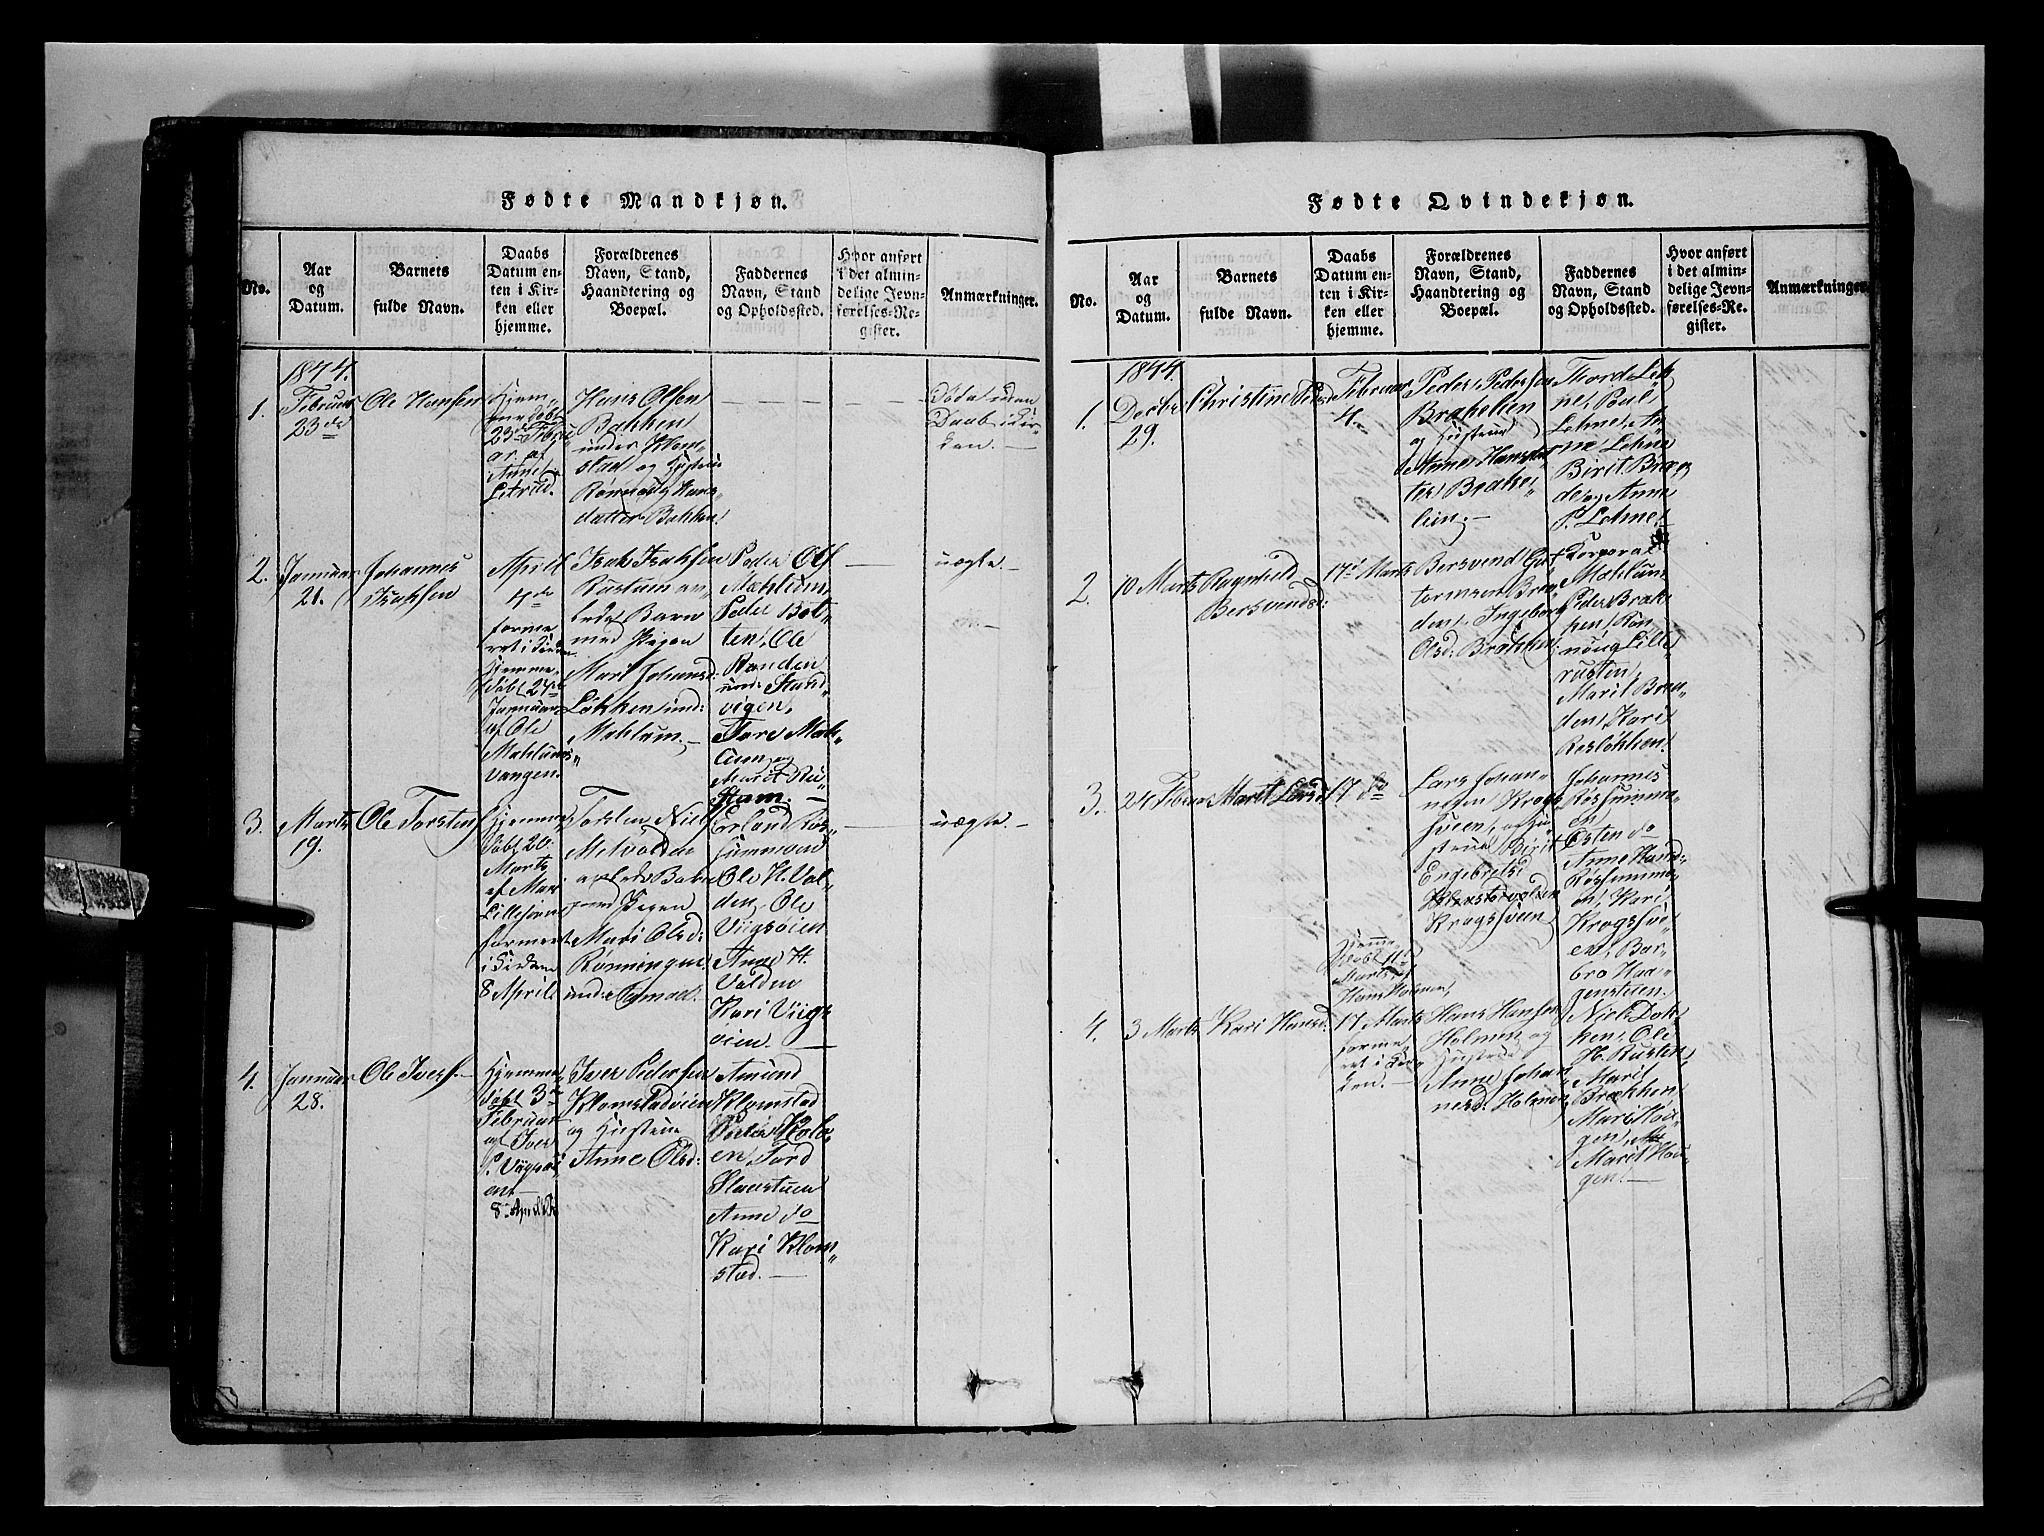 SAH, Fron prestekontor, H/Ha/Hab/L0002: Klokkerbok nr. 2, 1816-1850, s. 75b